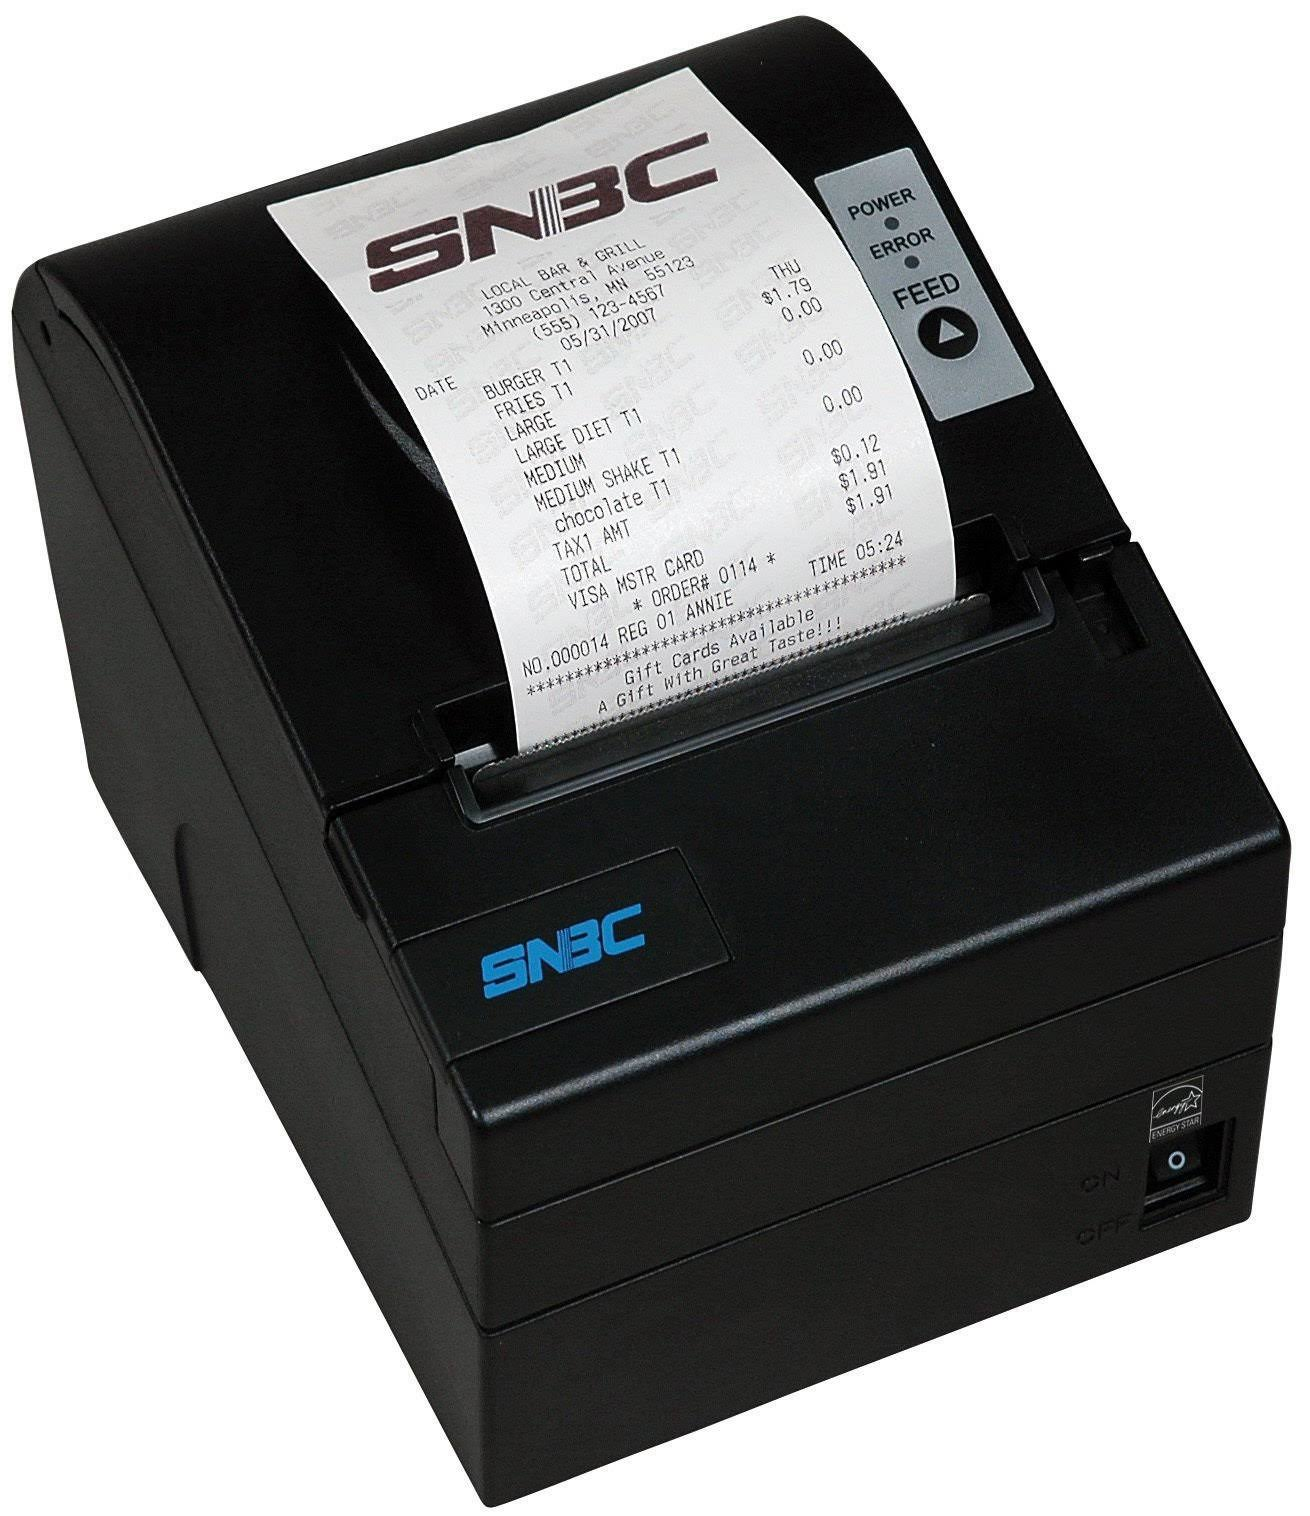 r880npv Snbc Btp termica serialeusbethernet ricevute Stampante per SUVpMqz